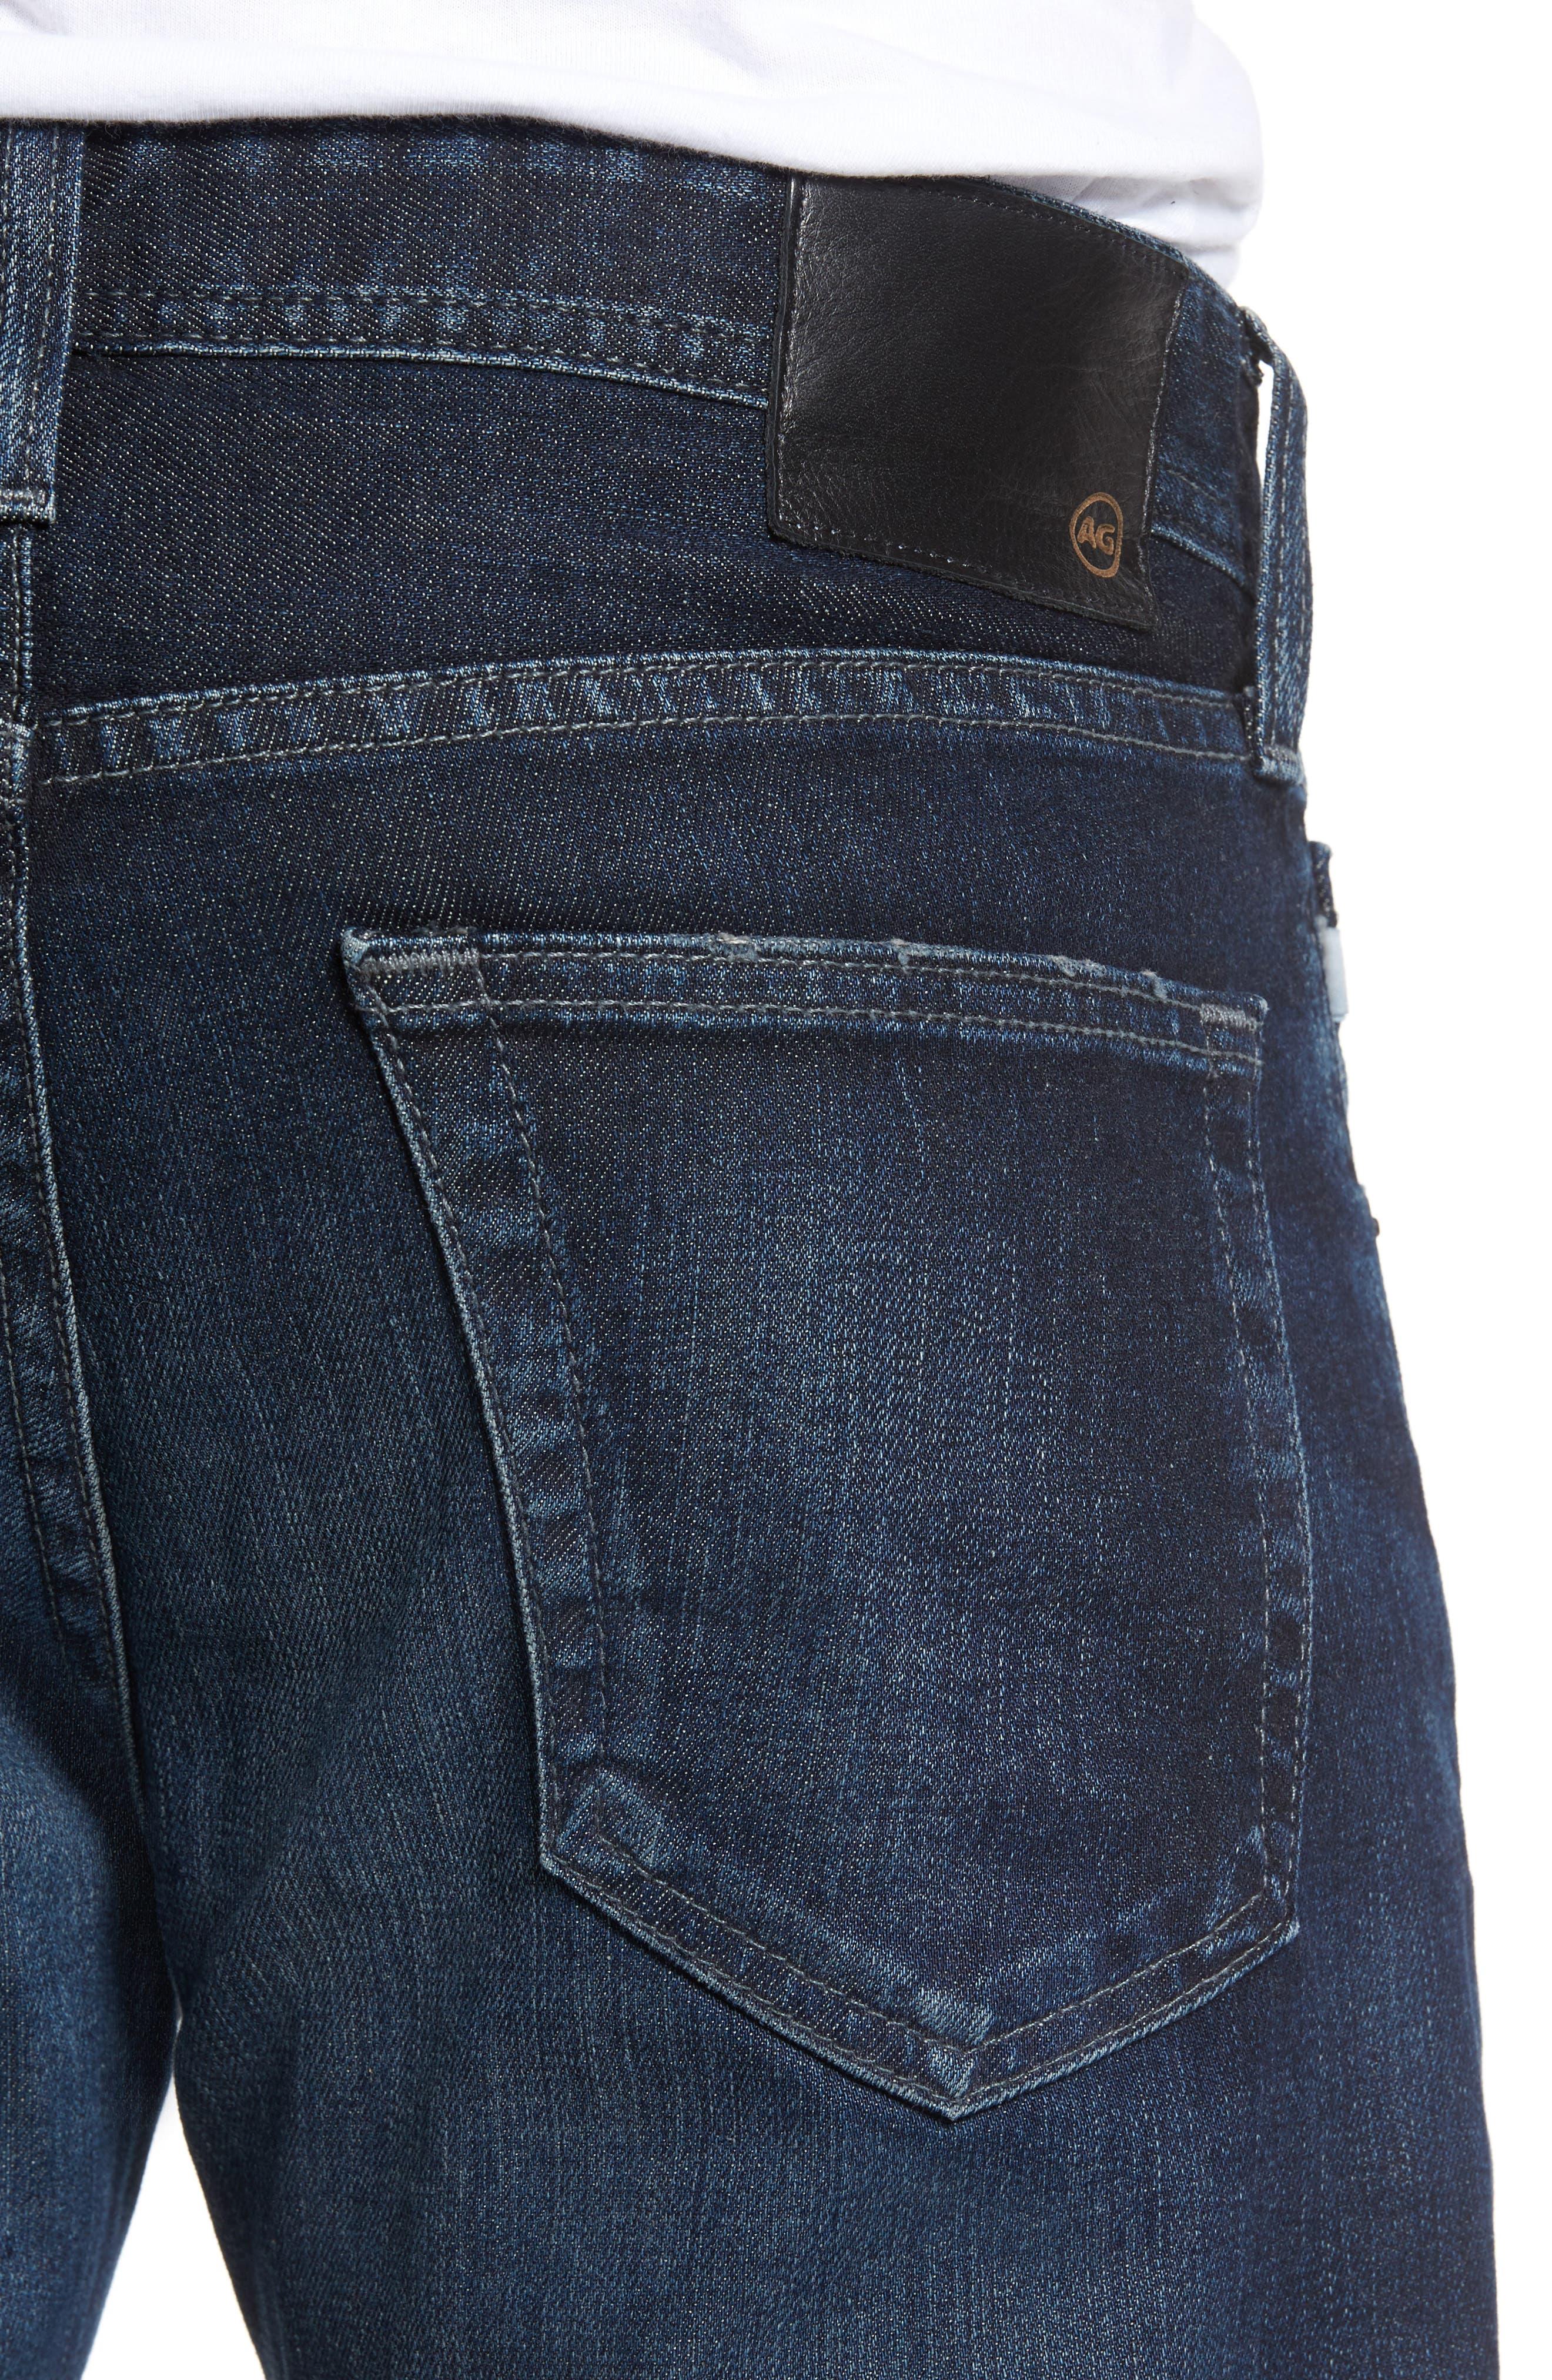 Tellis Slim Fit Jeans,                             Alternate thumbnail 4, color,